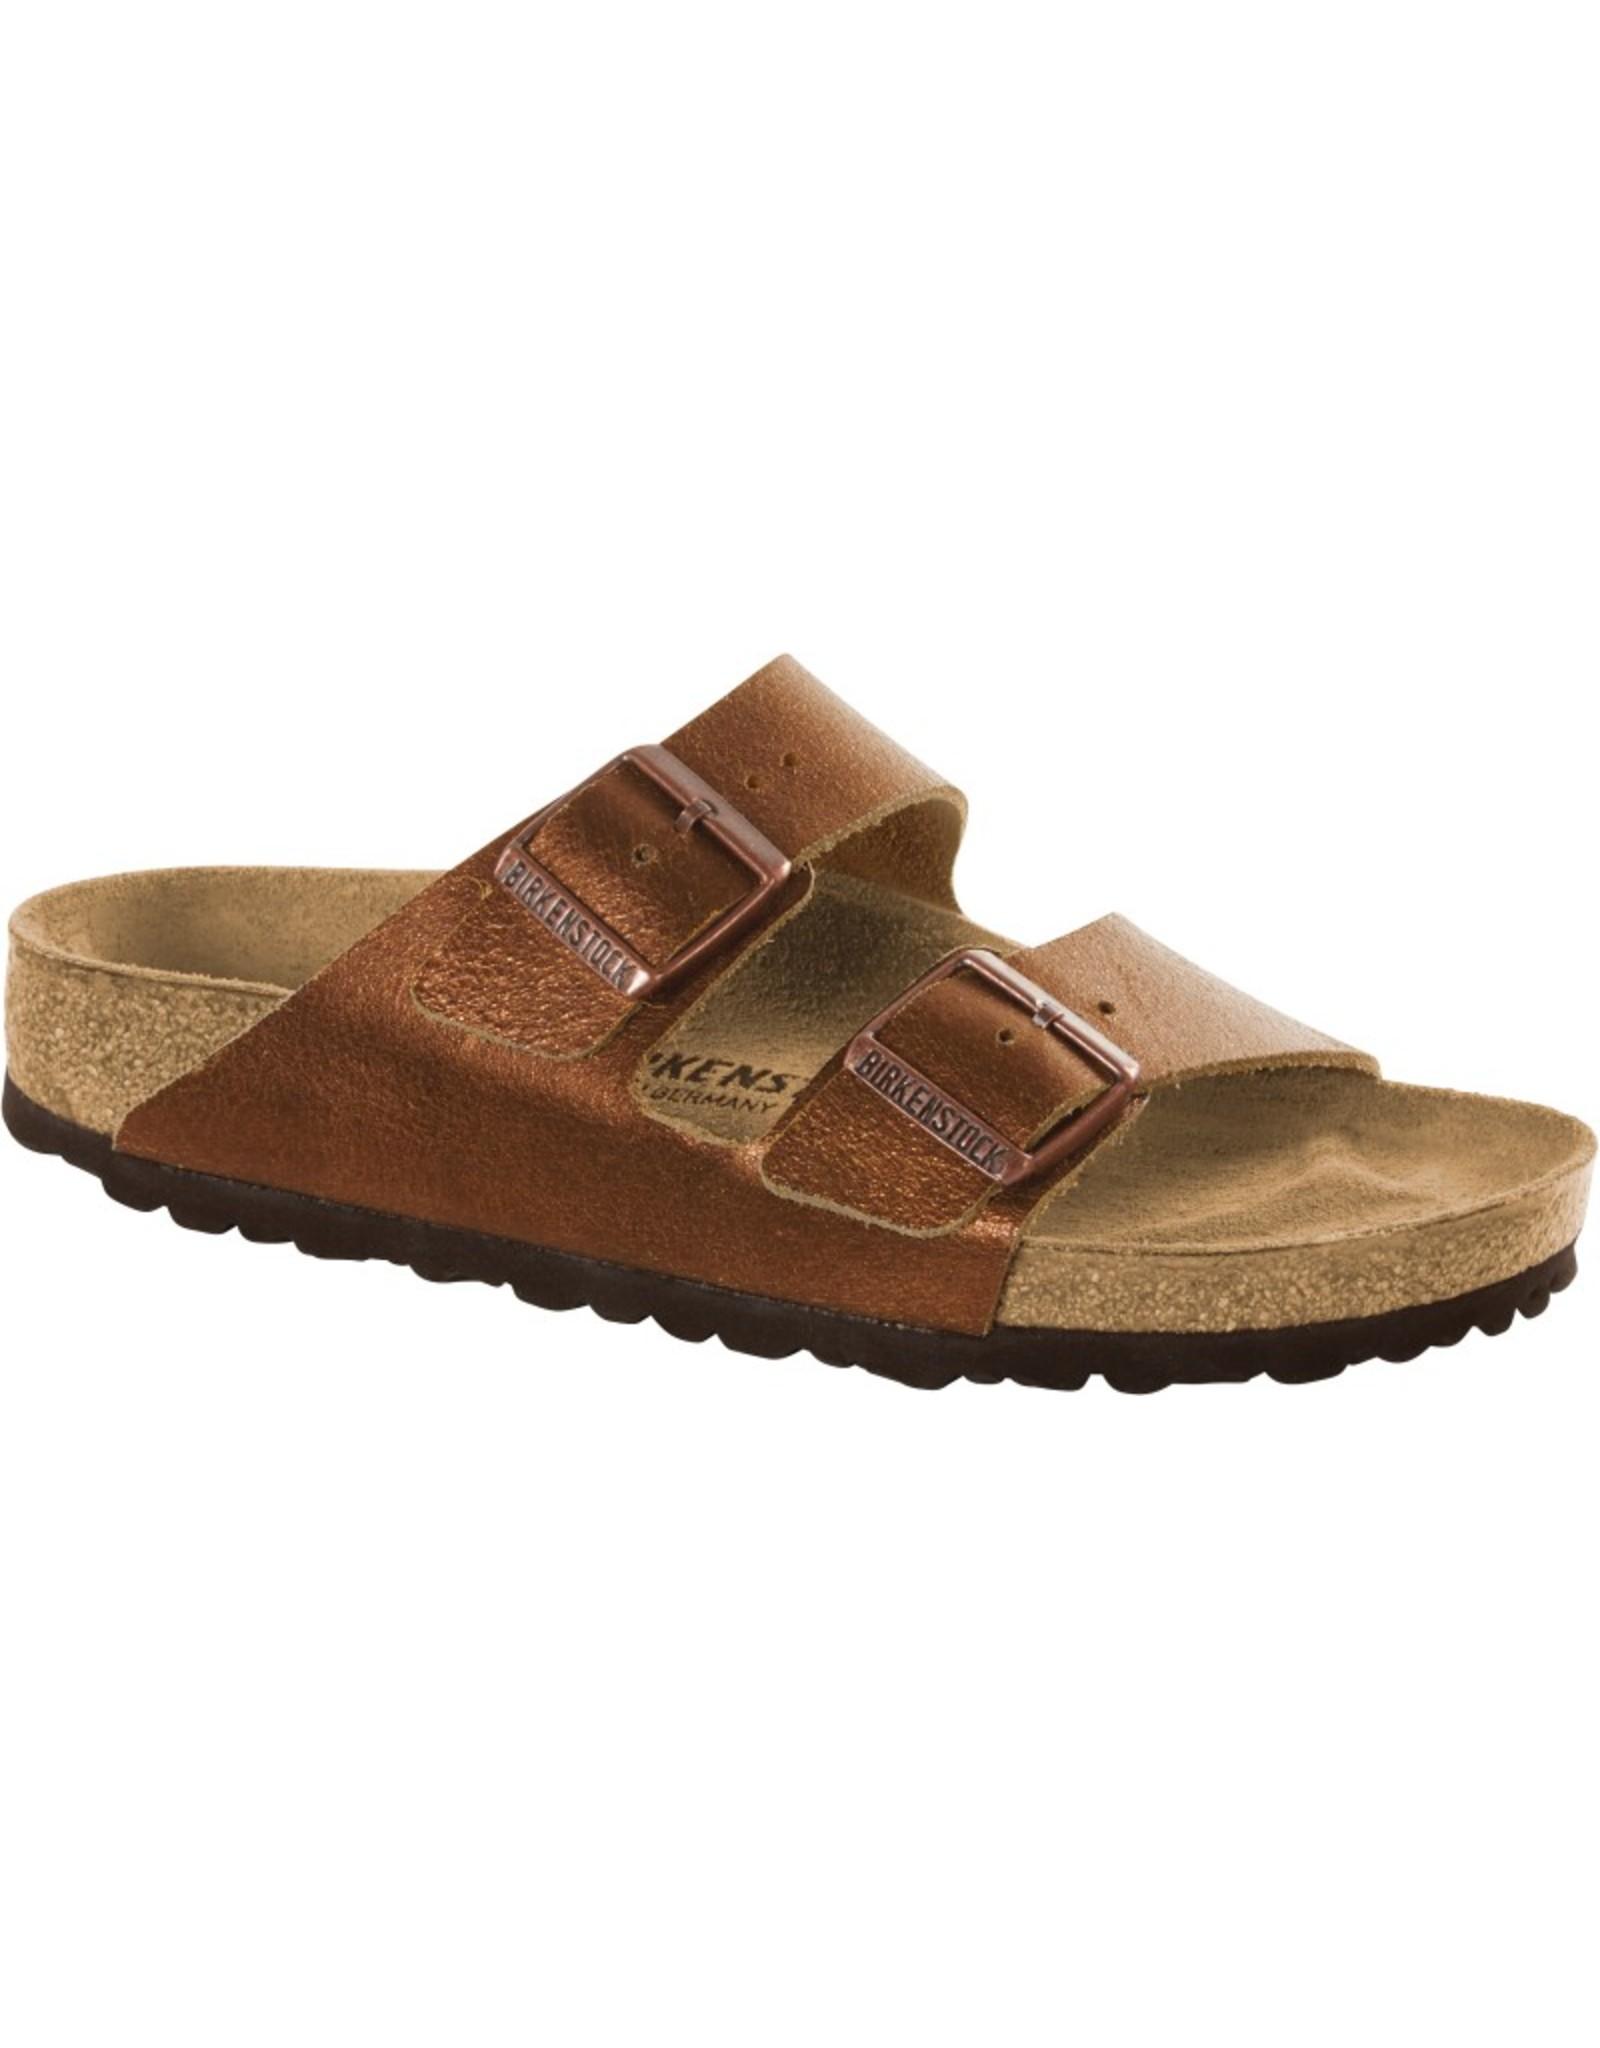 Birkenstock Arizona Washed Metallic Copper Leather Sandal